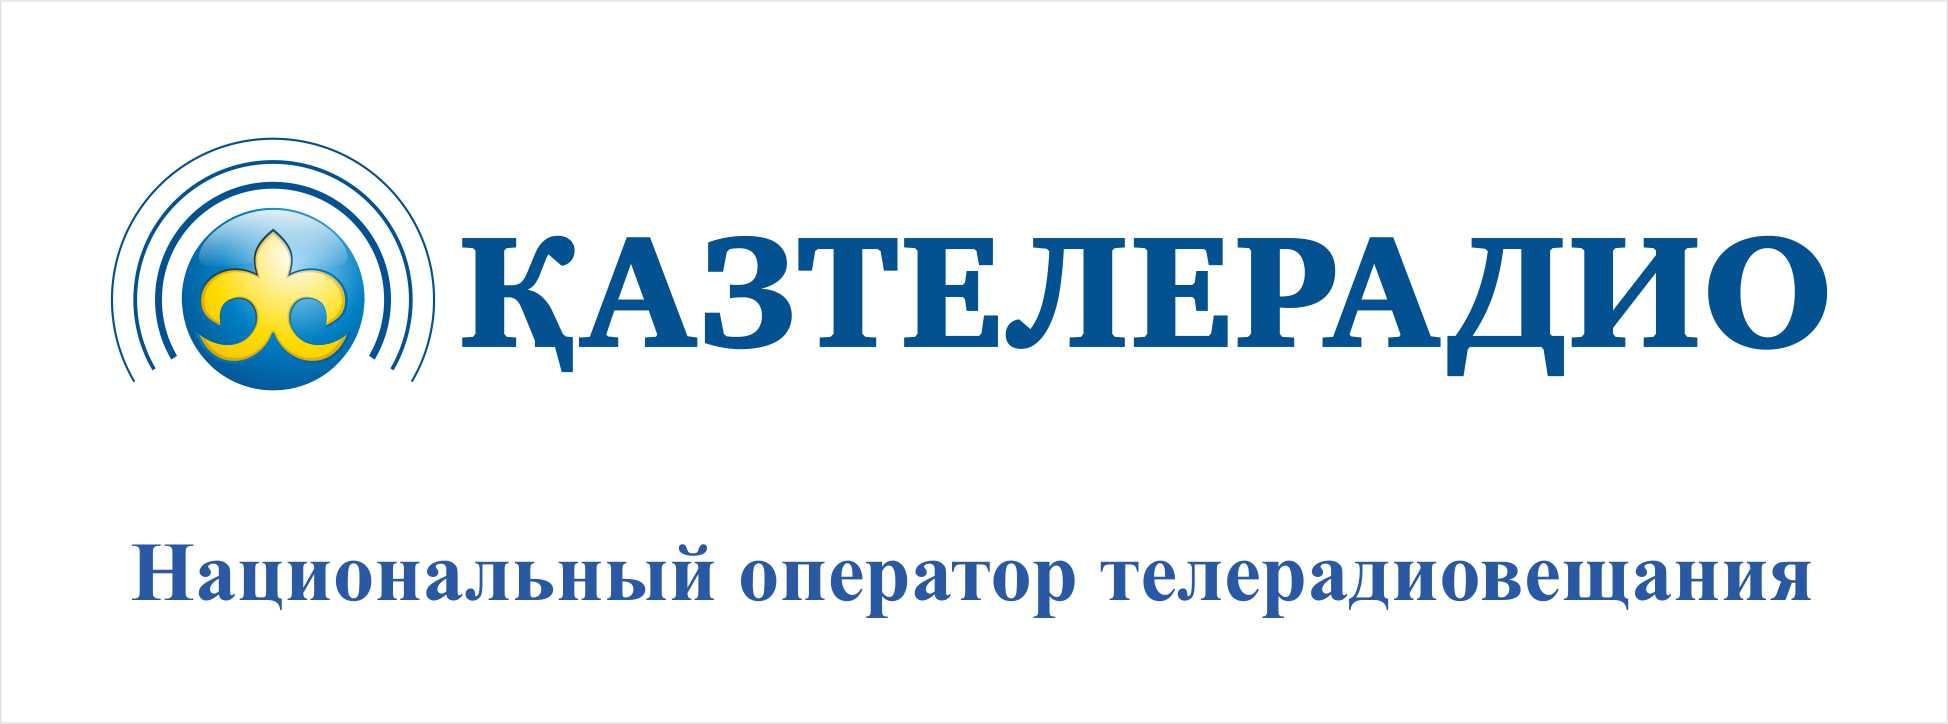 Веб-банер Казтелерадио_рус